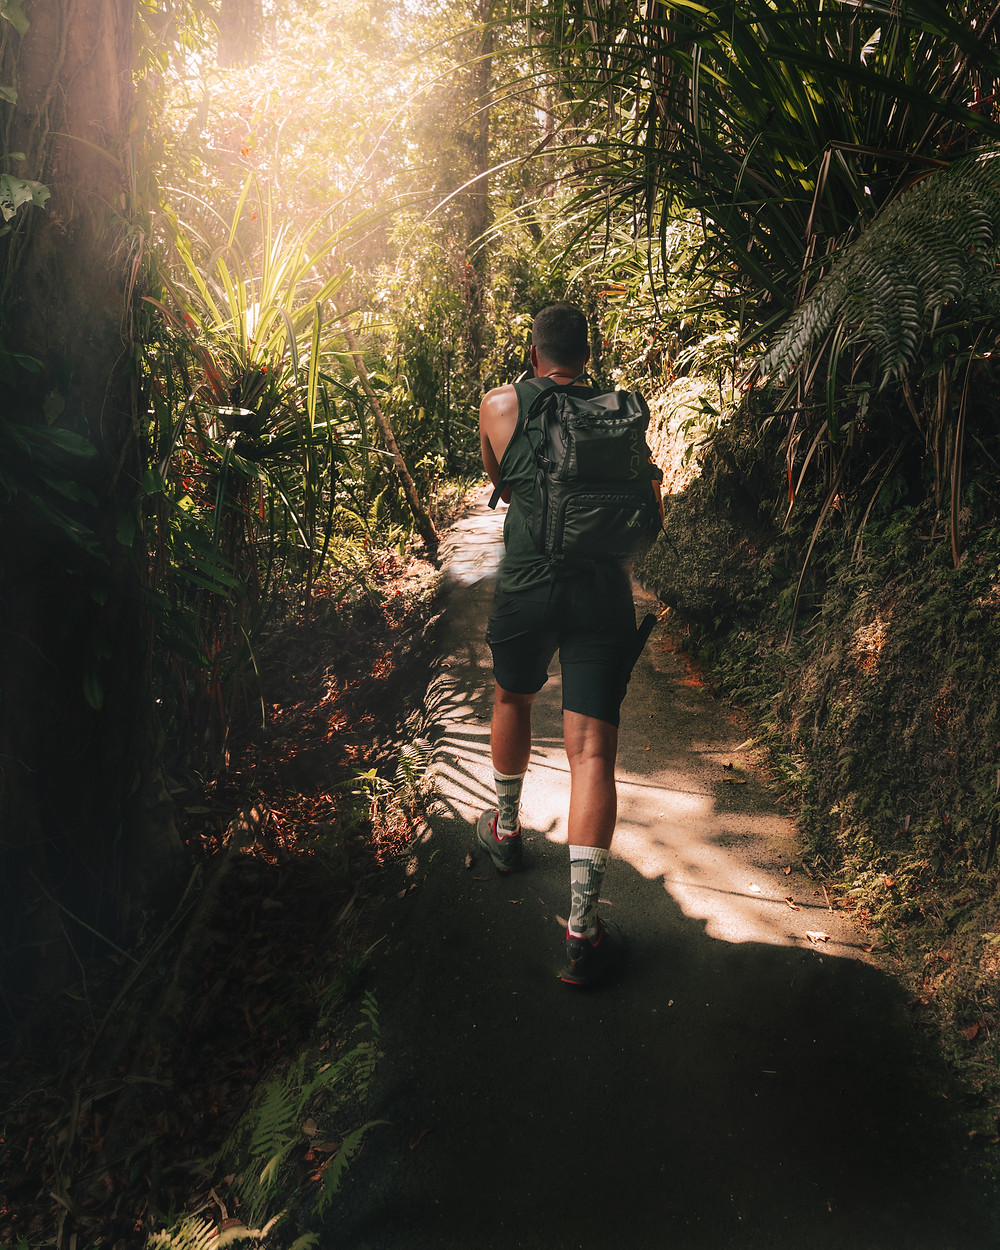 Man hiking through the jungle in Cairns, Australia